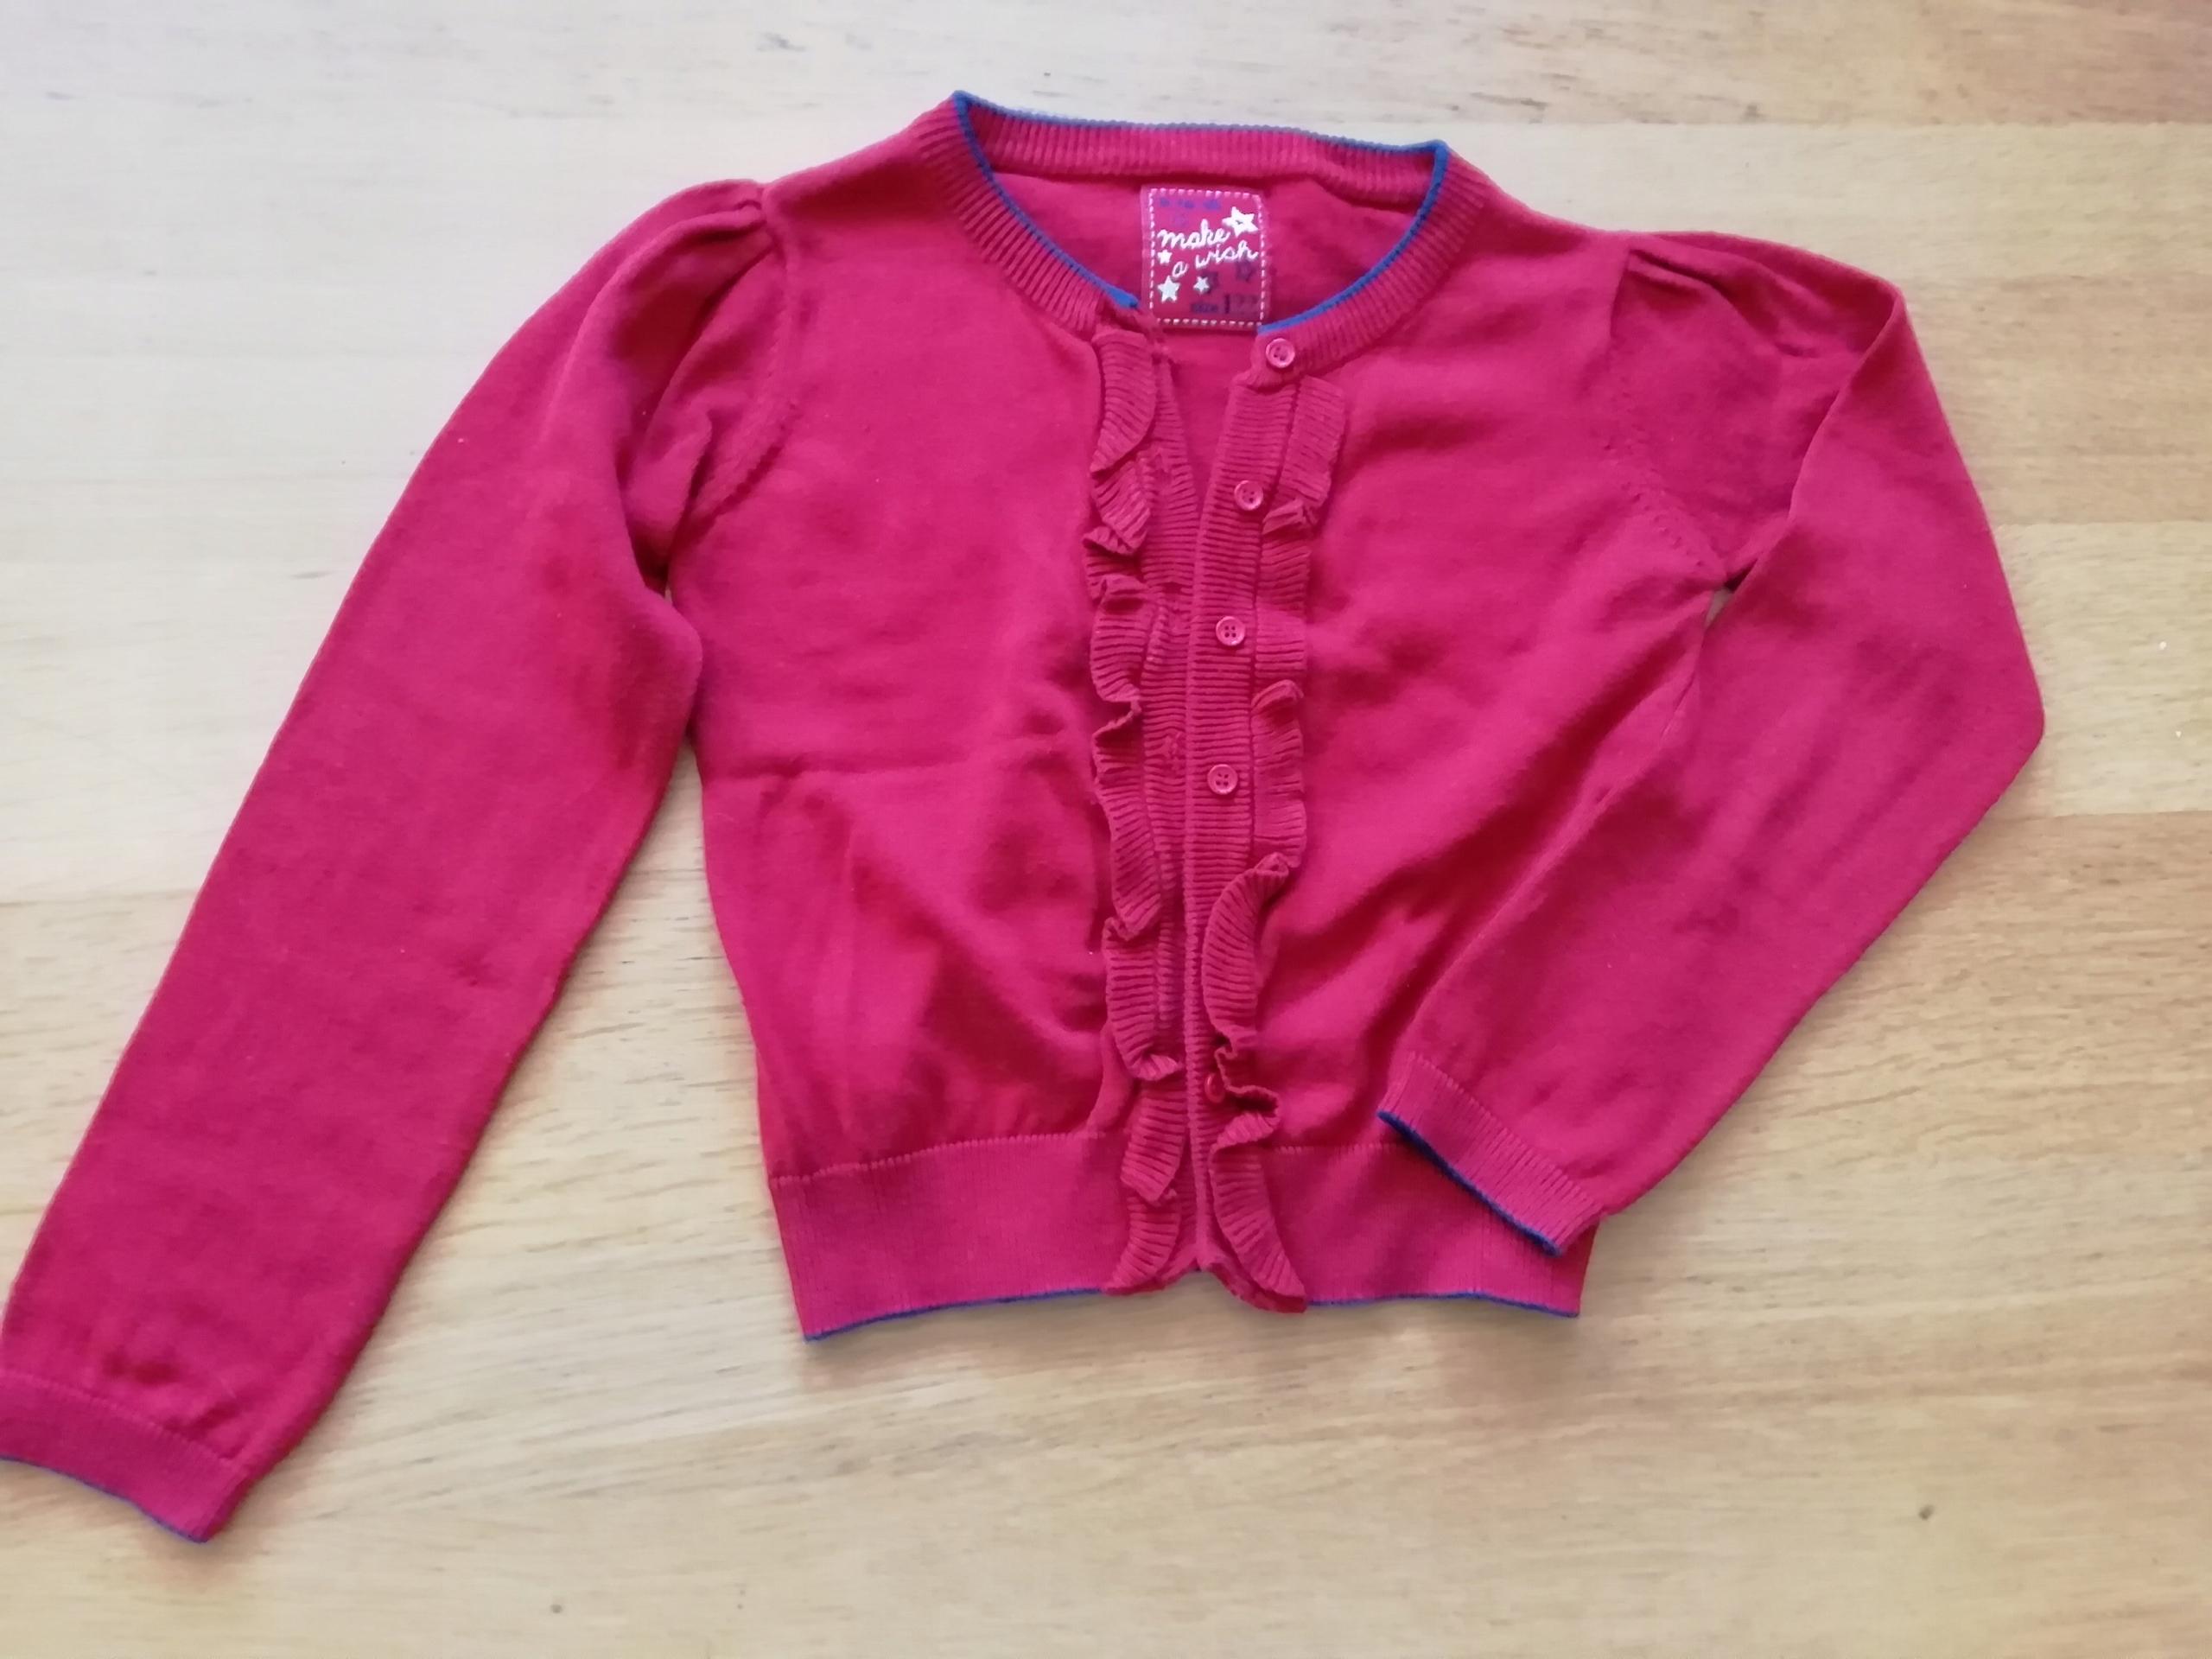 0c906e47fe Elegancki rozpinany sweterek dla dziewczynki - 7671791460 ...